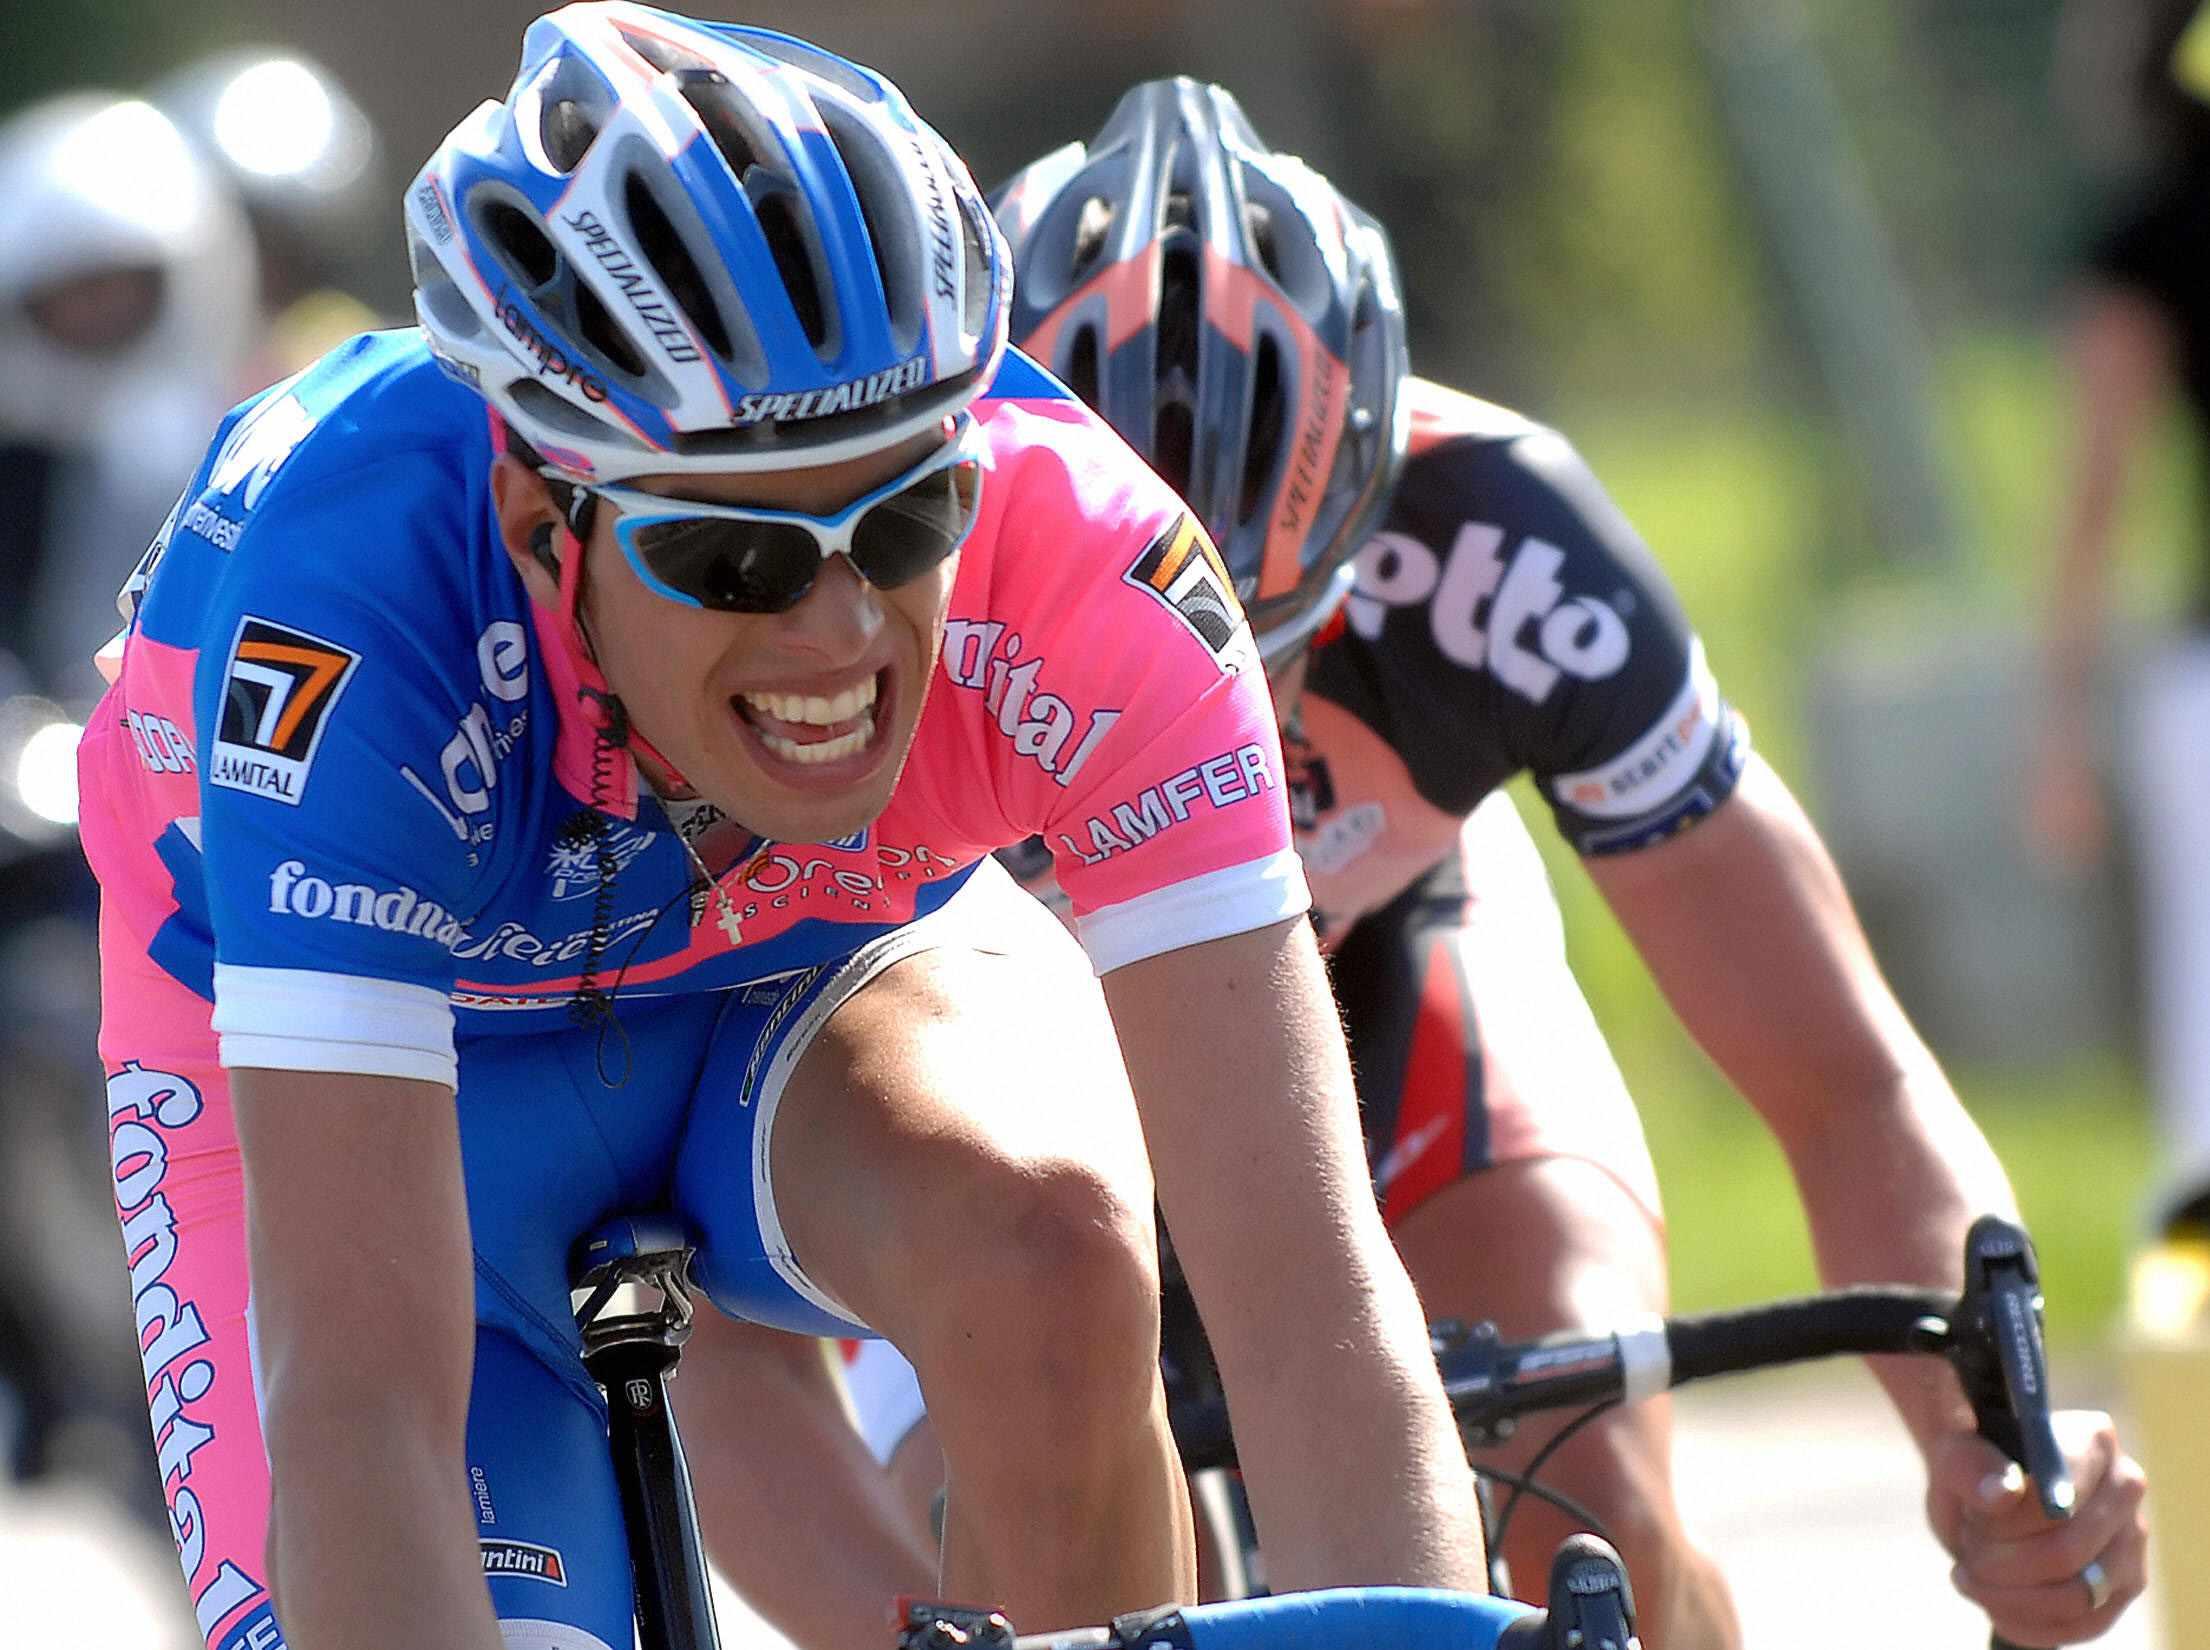 Alessandro Ballan (Lampre-Fondital) (file photo)